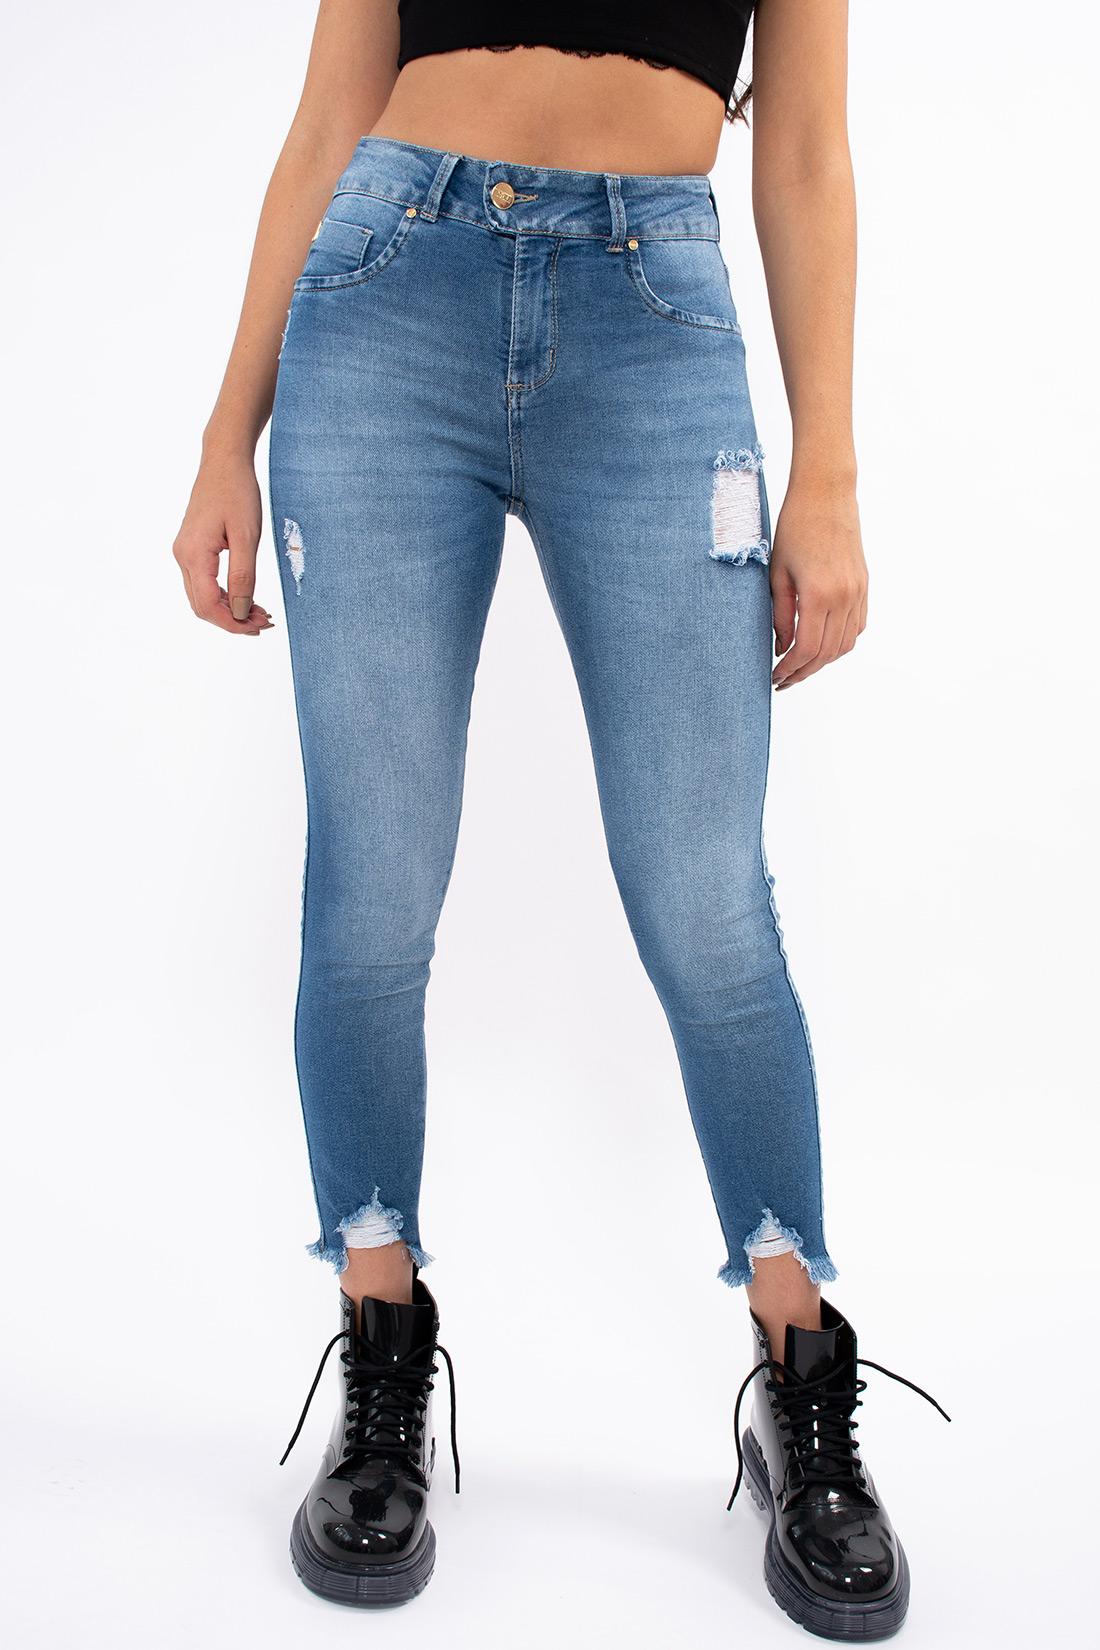 Calca Jeans Kacolako Cropped Destryed